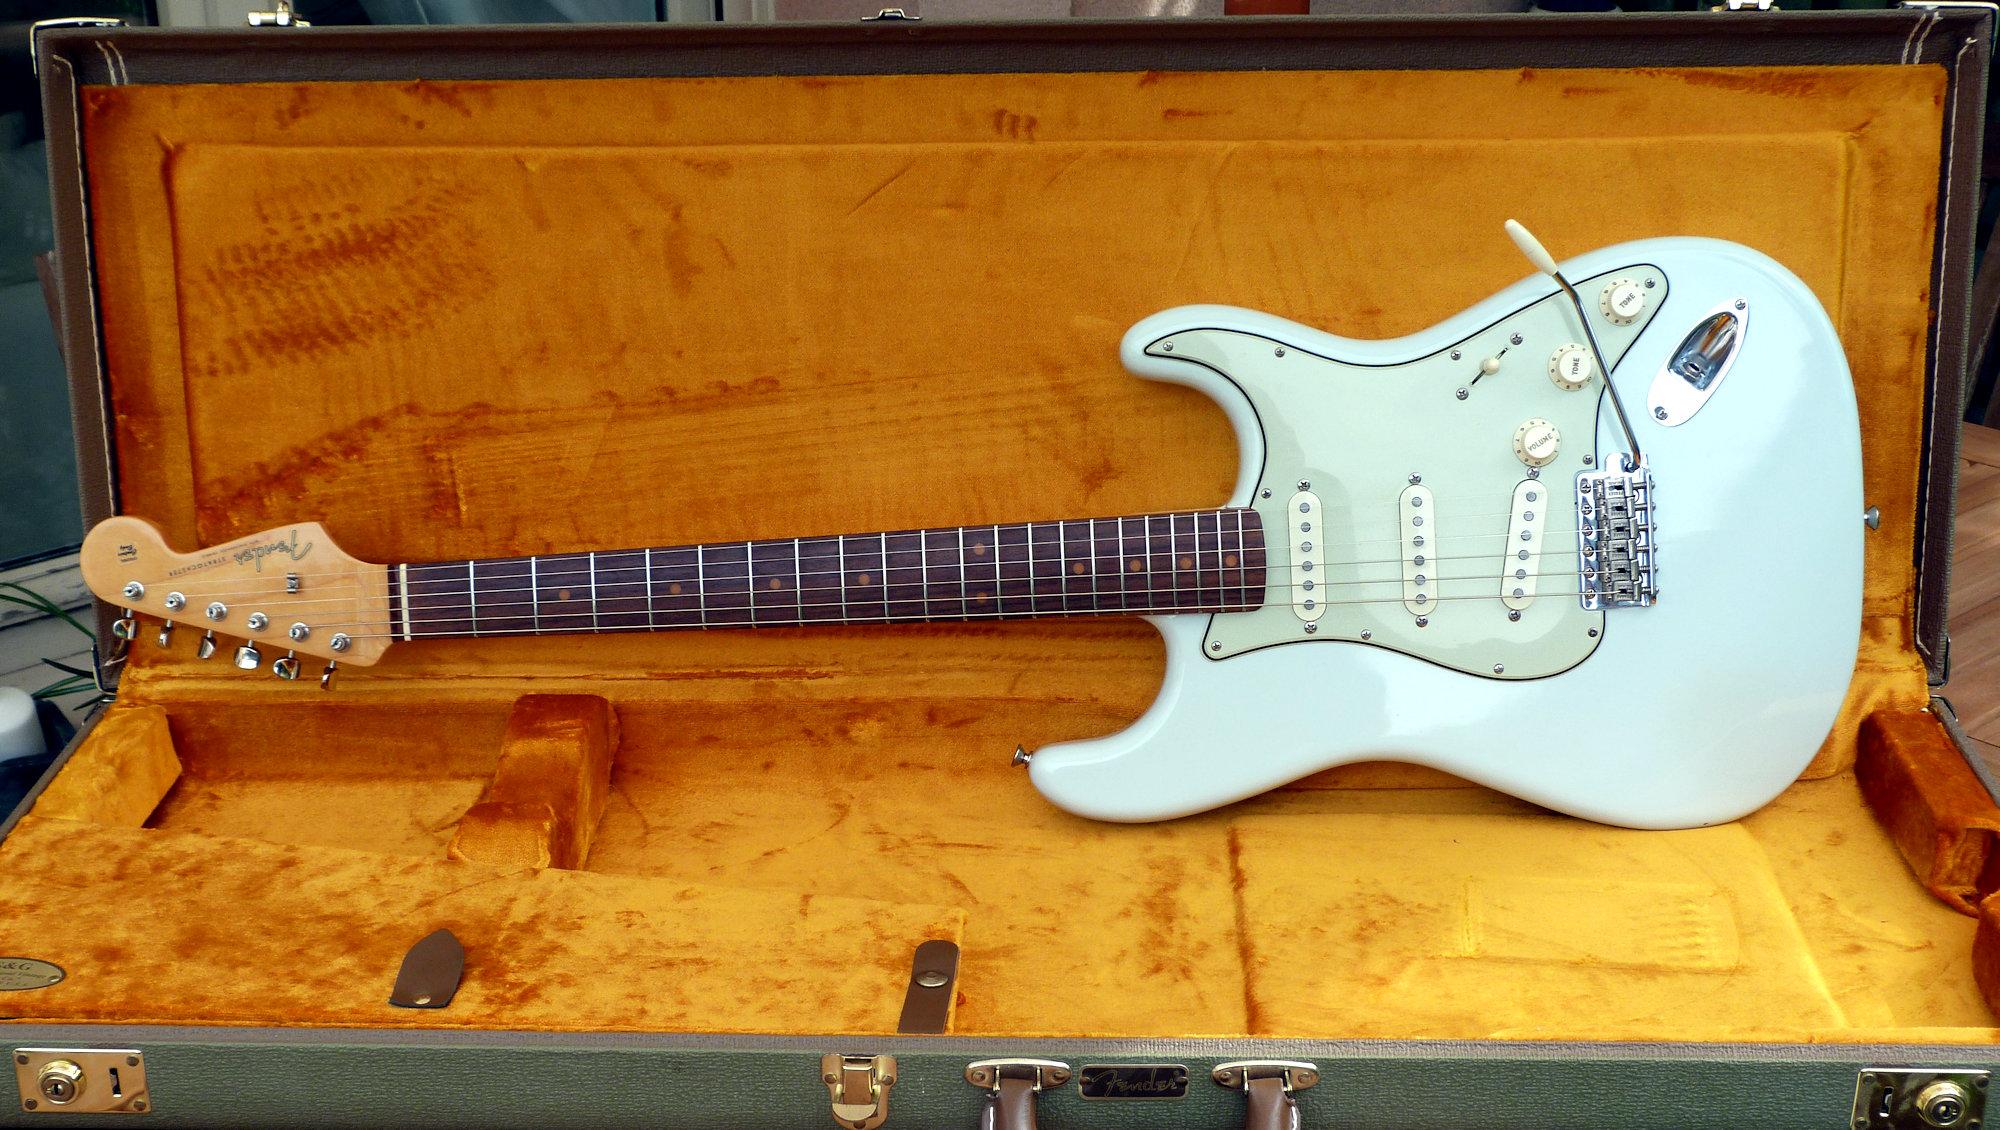 Fender American Vintage 59 Stratocaster Audiofanzine 60th Anniversary Wiring Diagram